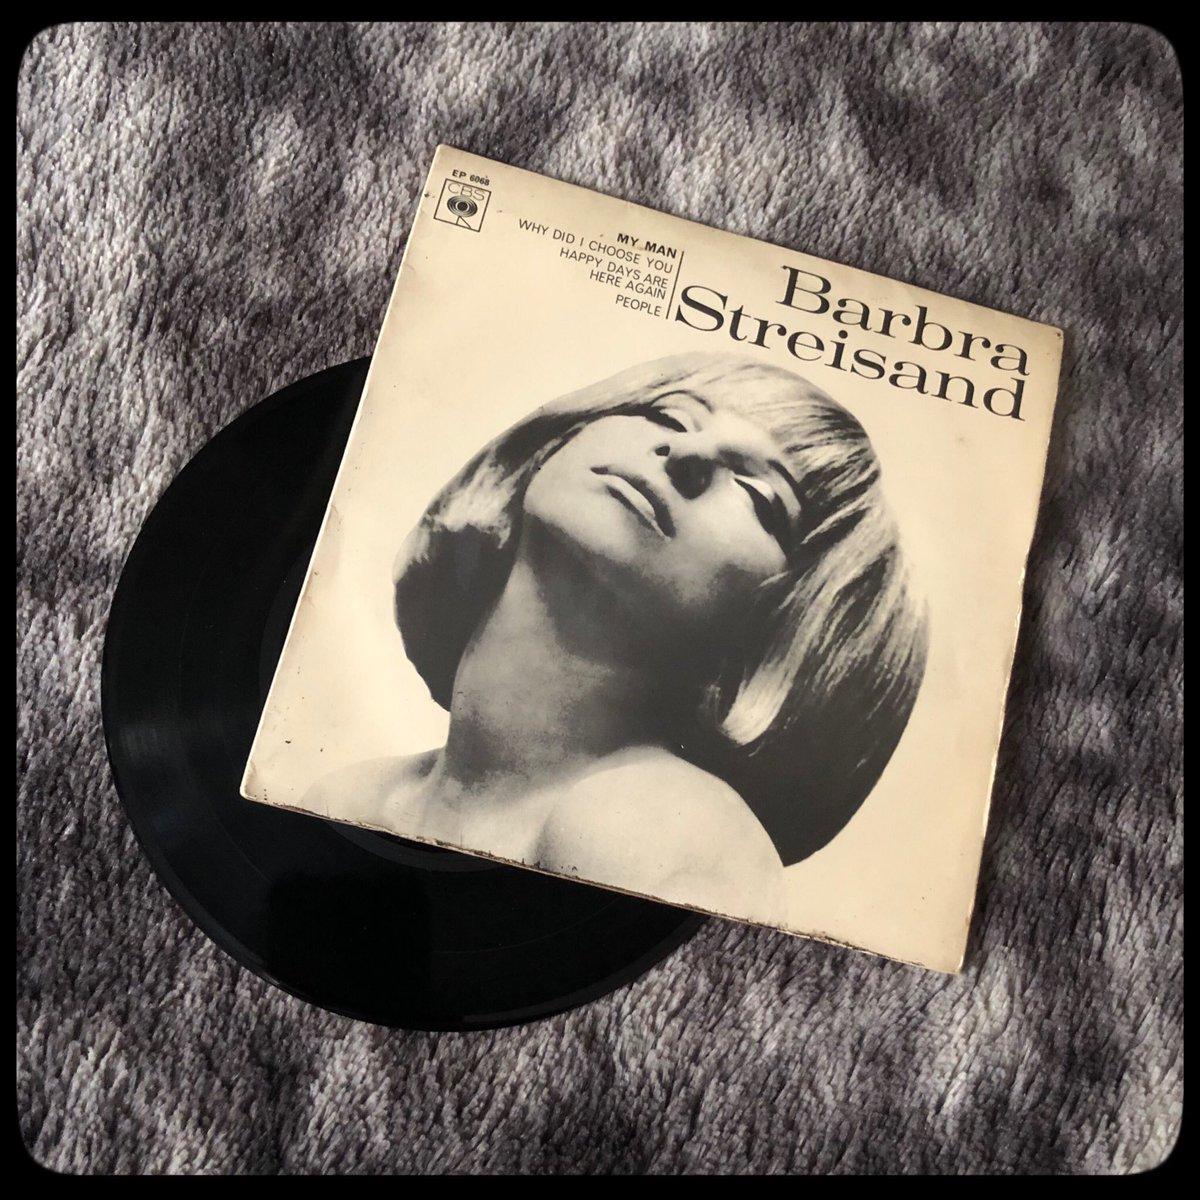 Barbra Streisand - My Man (Single) - 1965  #barbrastreisand #streisand #myman #mymansingle #7inch #7inchsingle #7inchrecord #7inchvinyl #vinyl #vinylcollection #myvinylcollection #ilovevinyl #music #ilovemusic #barbrastreisandvinyl #vinyloftheday #1965pic.twitter.com/LcxyPSO9EK